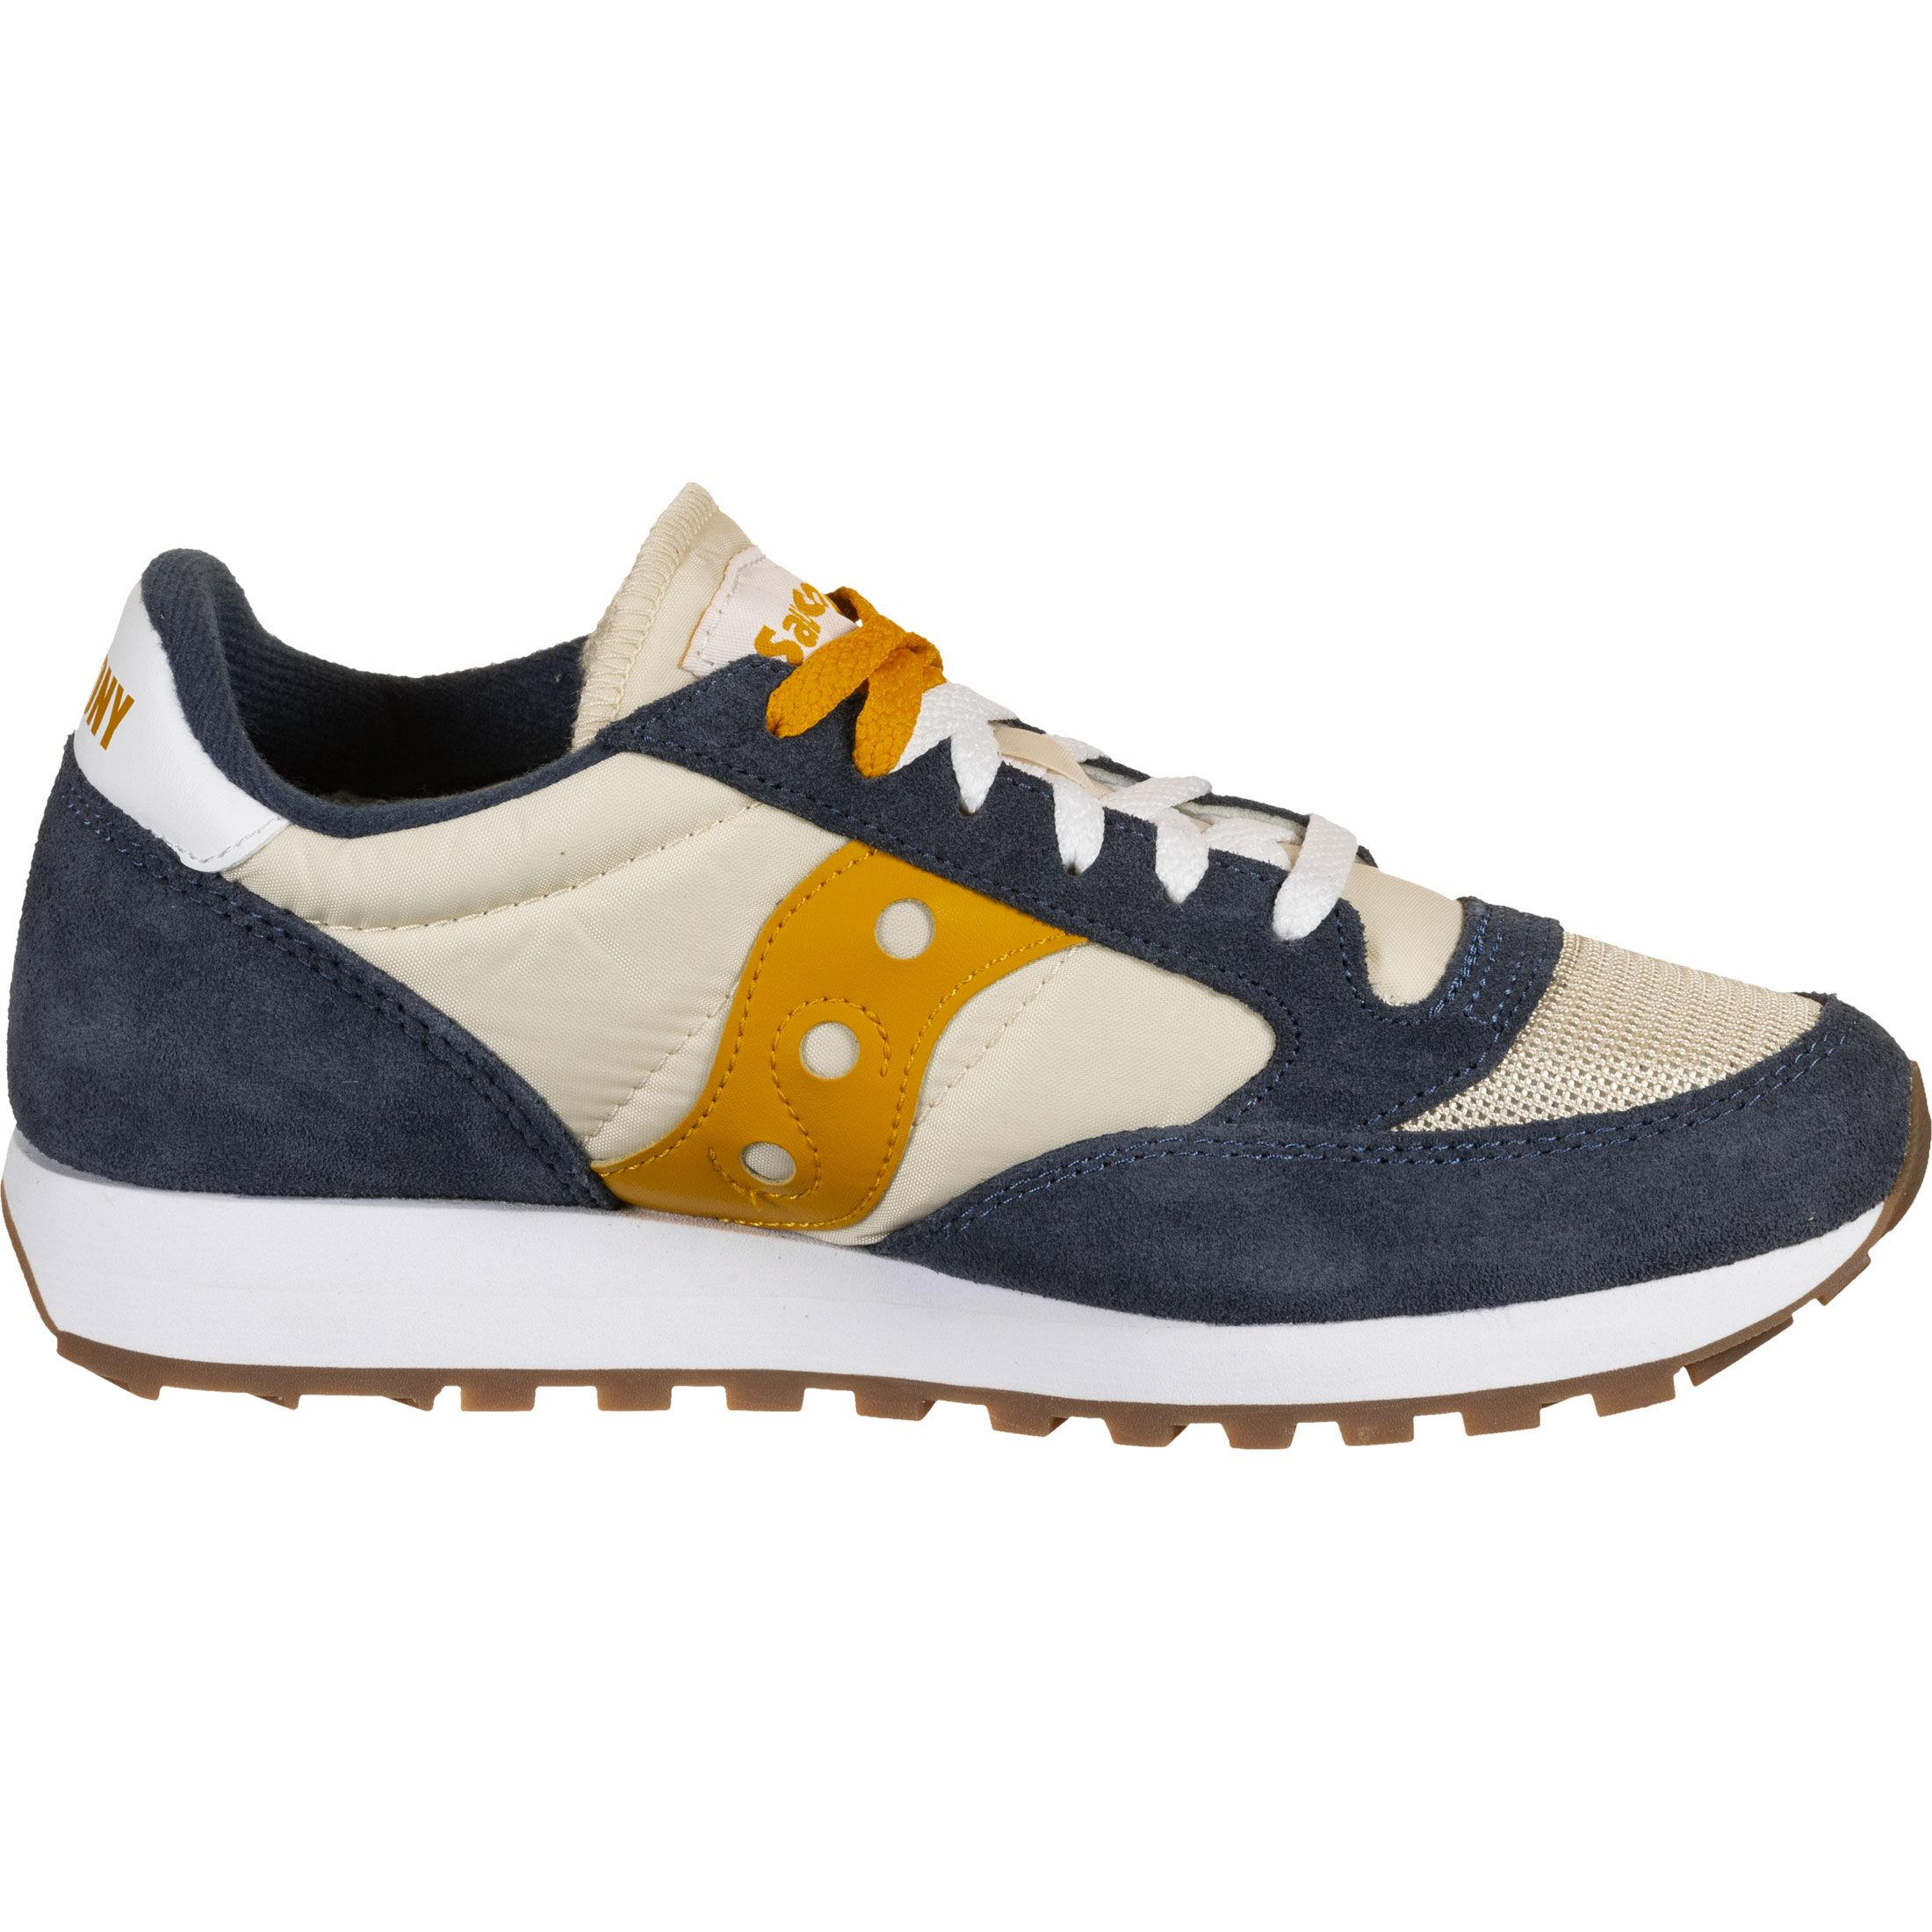 Saucony Jazz Original Herren Sneaker Turnschuhe Schuhe Beige Grün NEU S70463-7